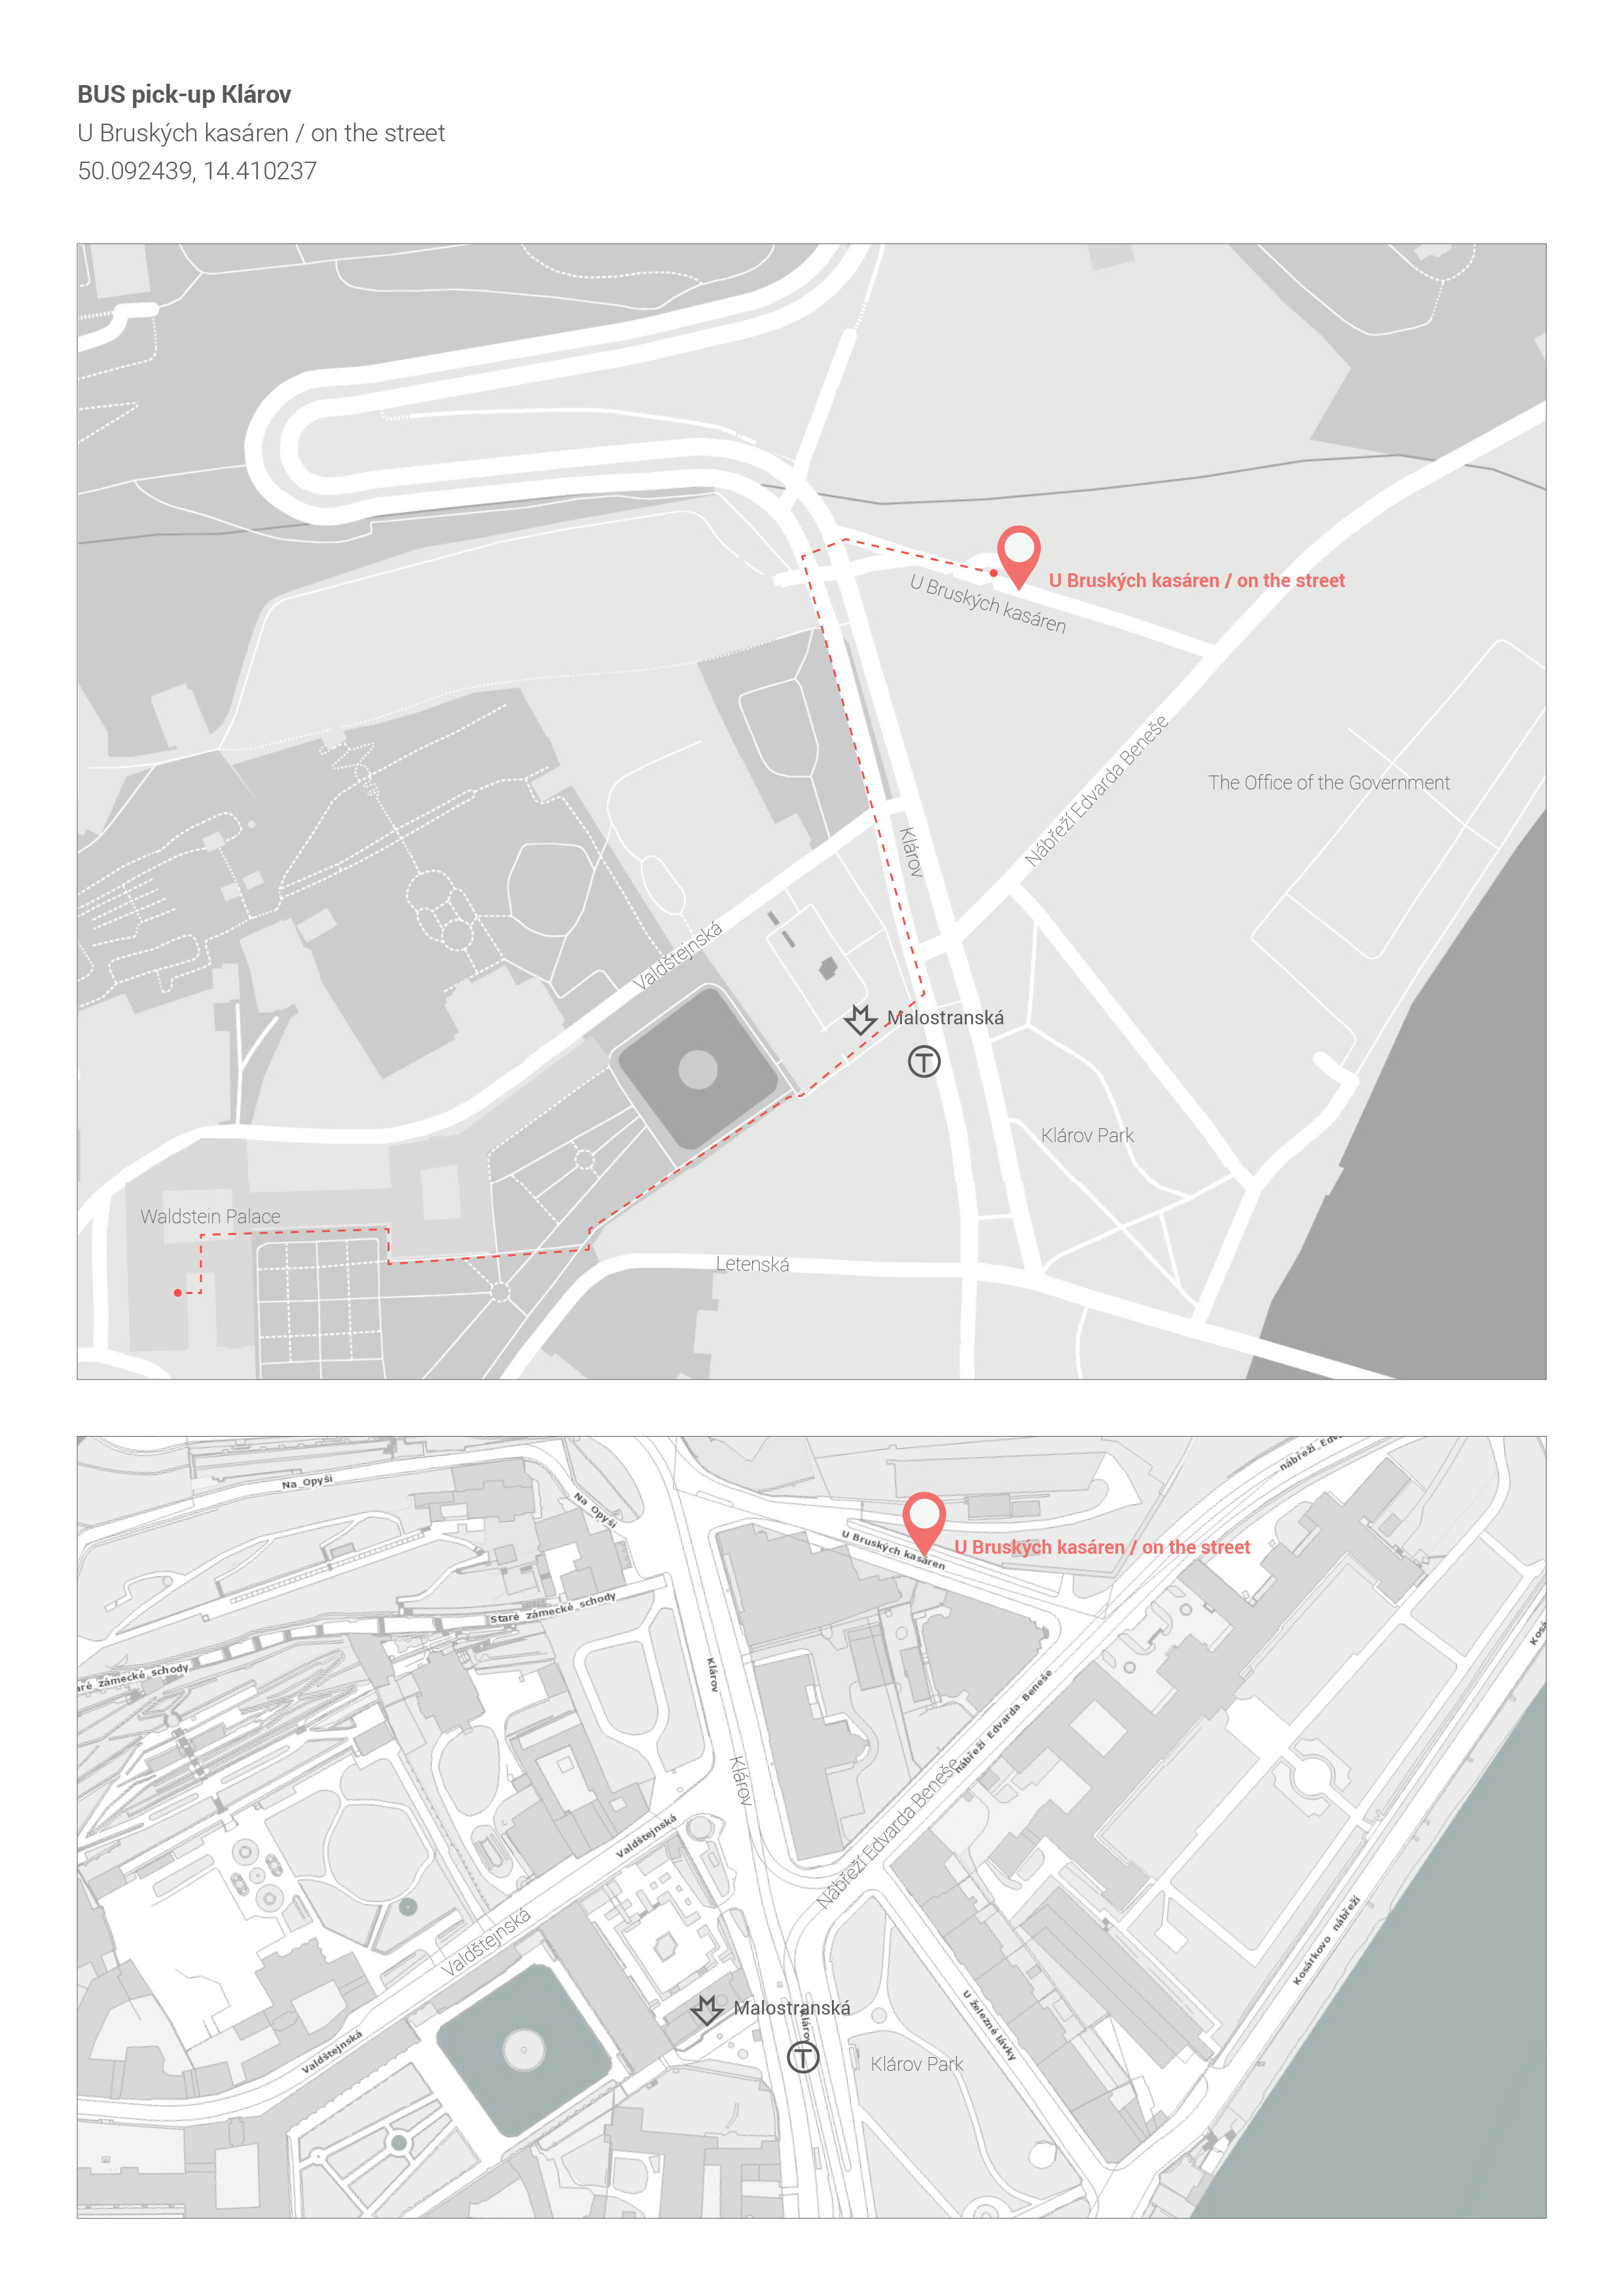 AIA_Prague_locations-17-09-2910.jpg